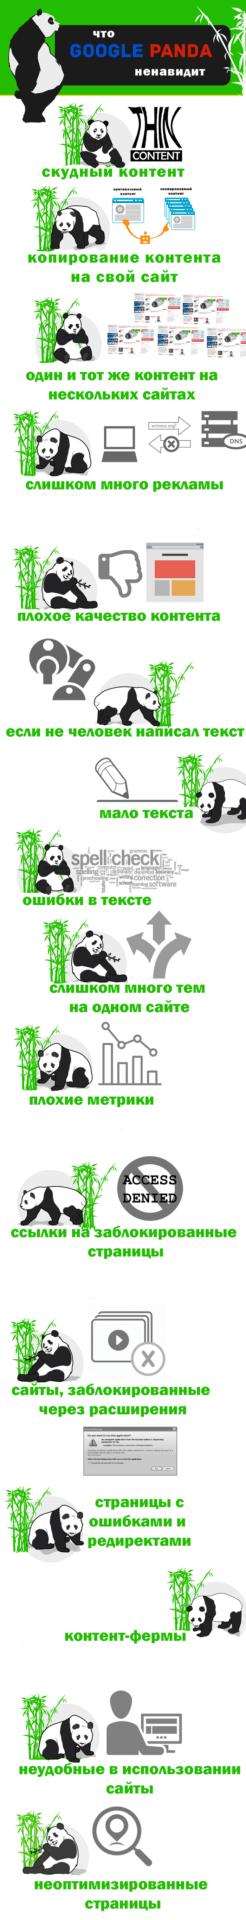 Google Panda 2018. Инфографика 2